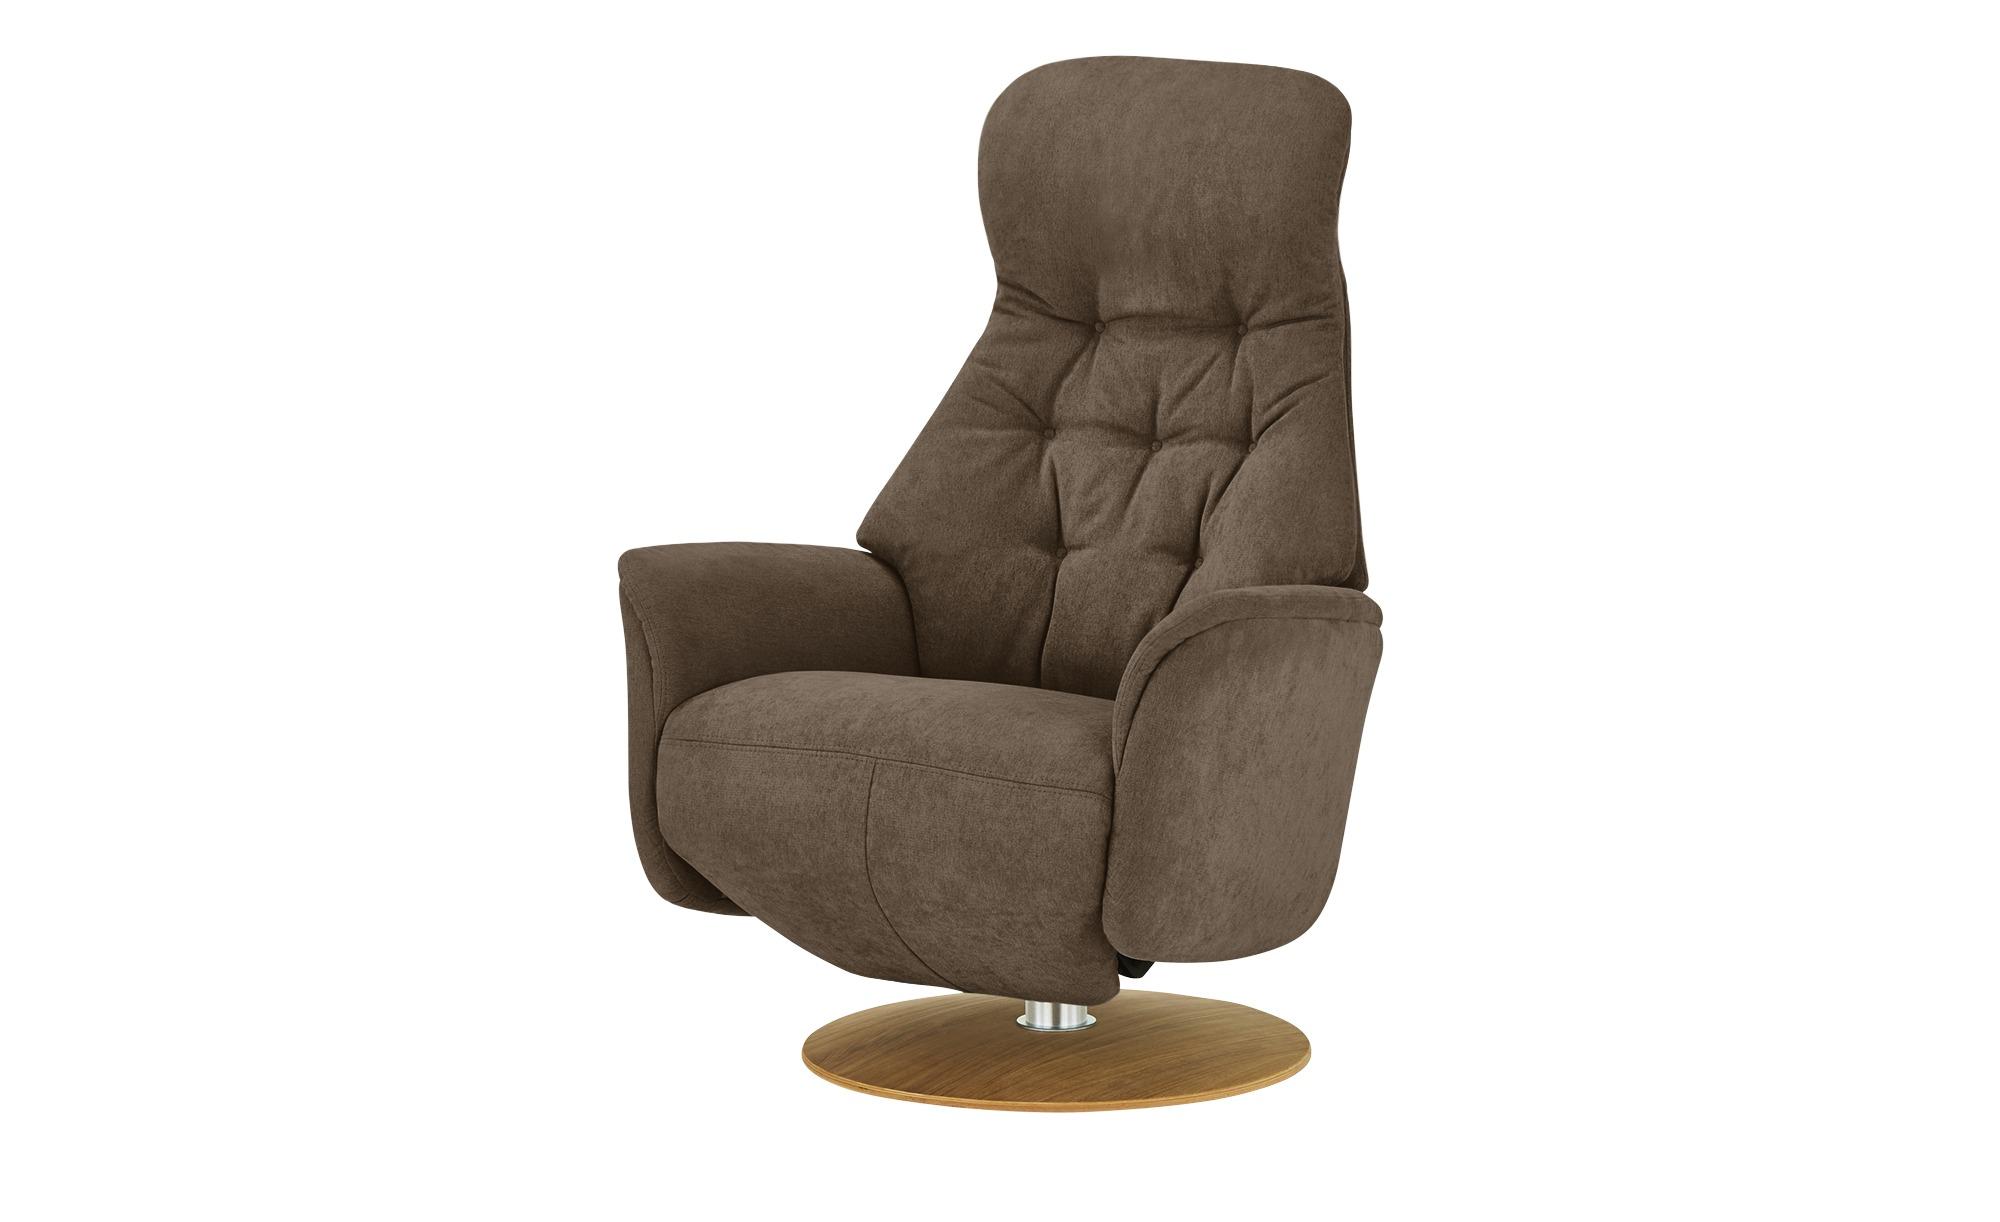 Nils Olsen Relaxsessel  Arend ¦ braun ¦ Maße (cm): B: 74 H: 110 T: 80 Polstermöbel > Sessel > Fernsehsessel - Höffner